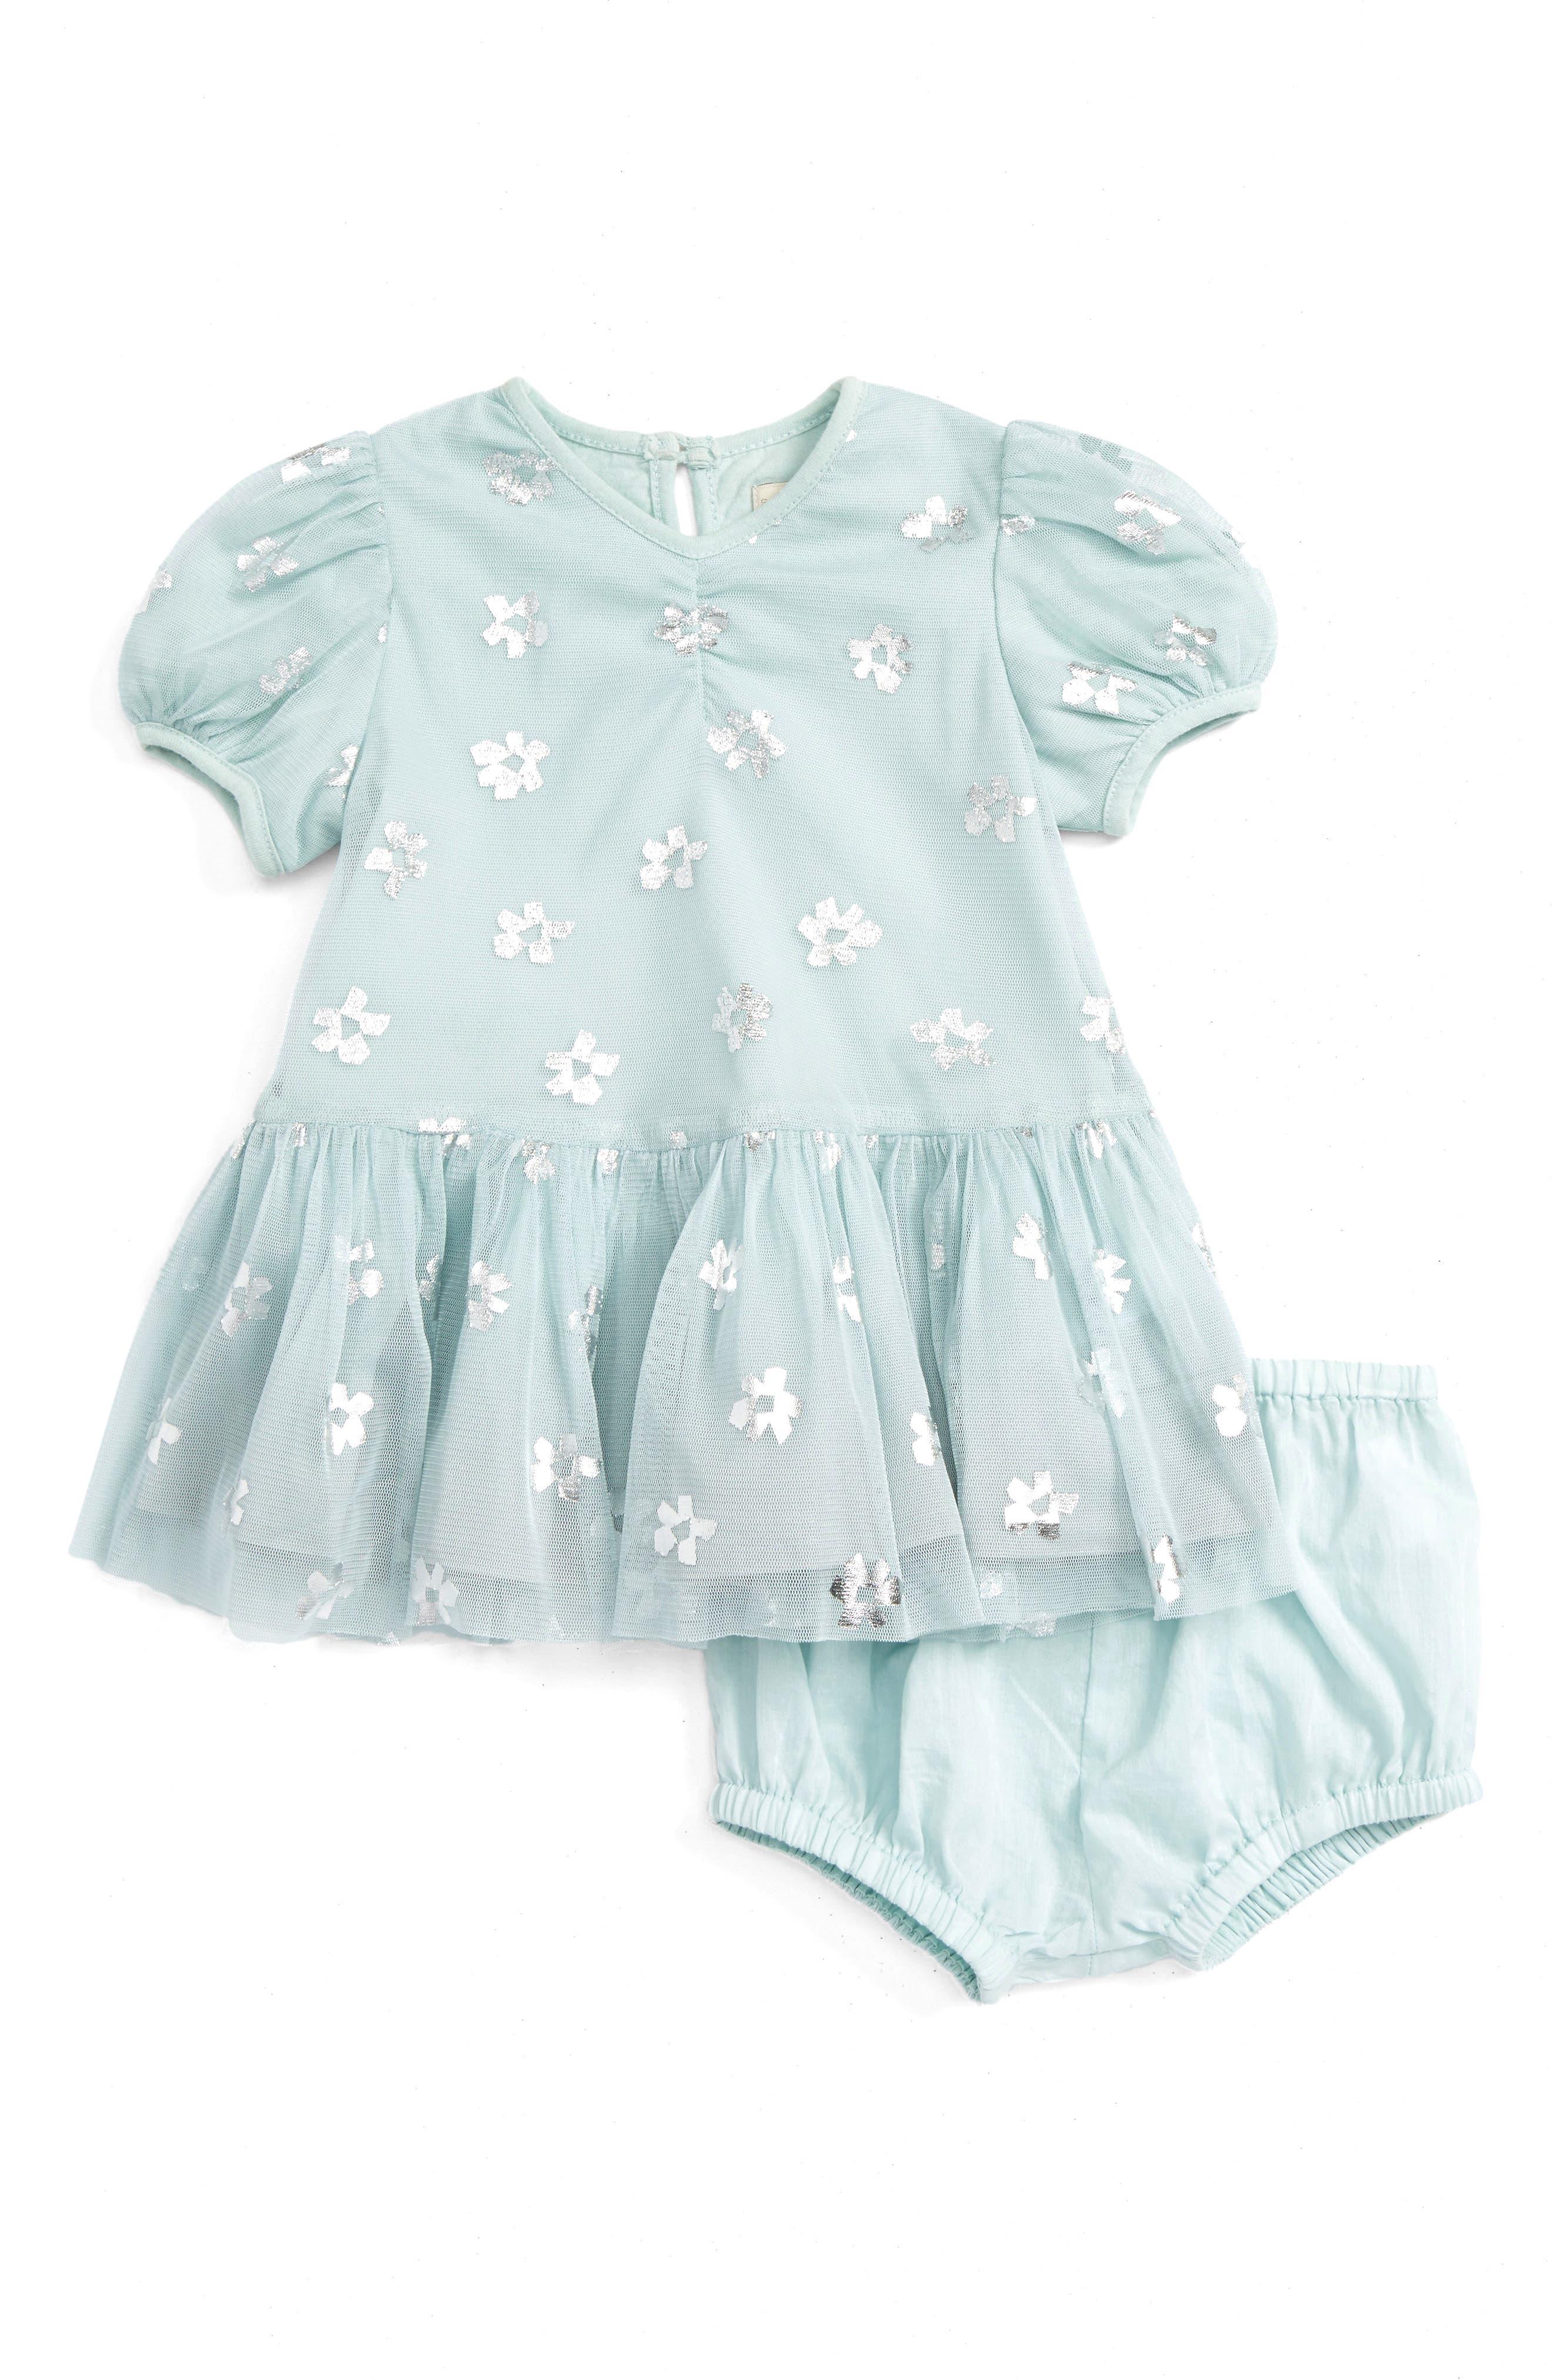 Stella McCartney Kids Missy Tulle Dress (Baby Girls)